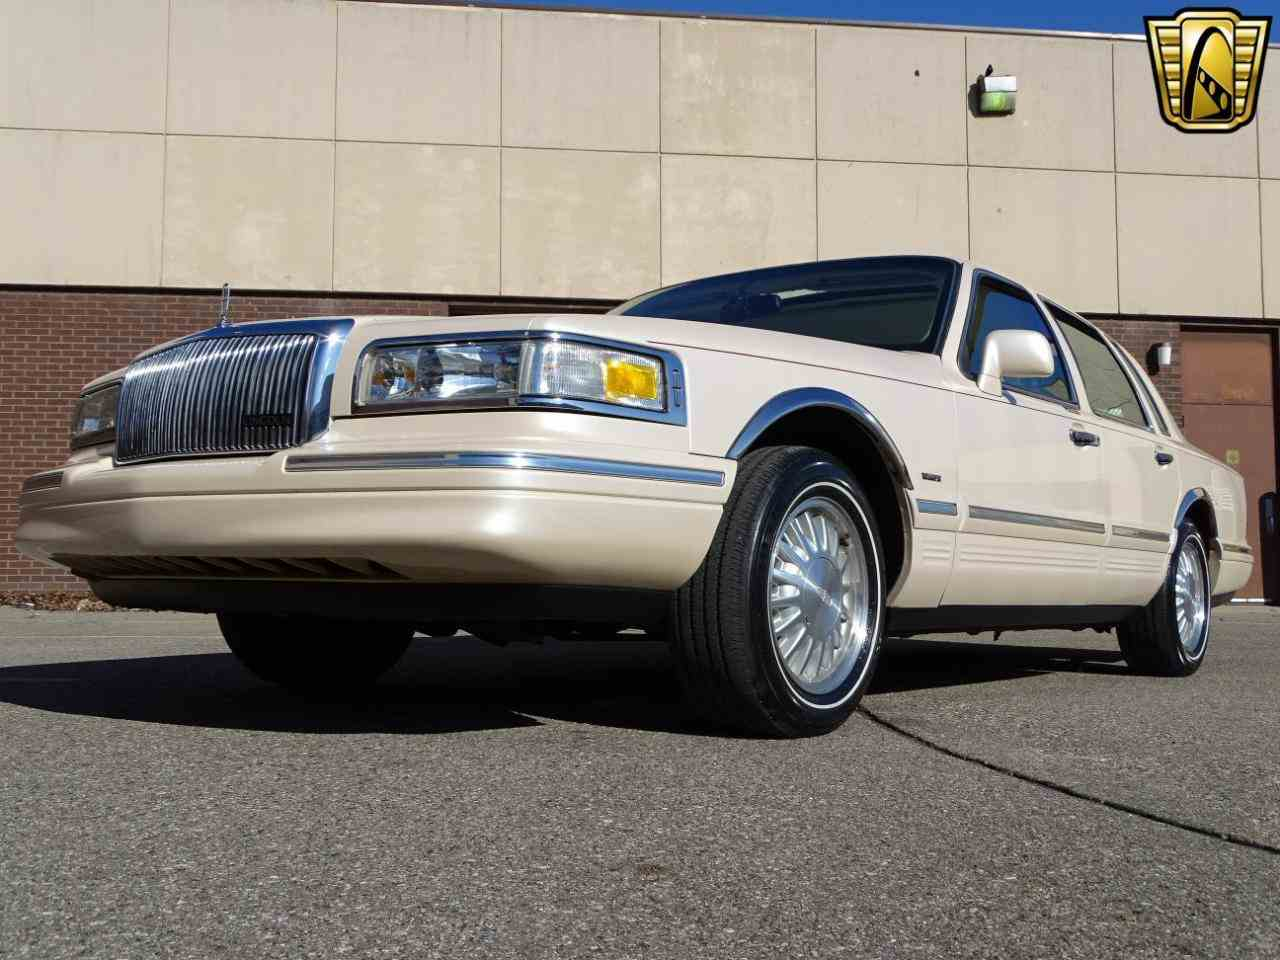 1997 lincoln town car for sale cc 1075972. Black Bedroom Furniture Sets. Home Design Ideas